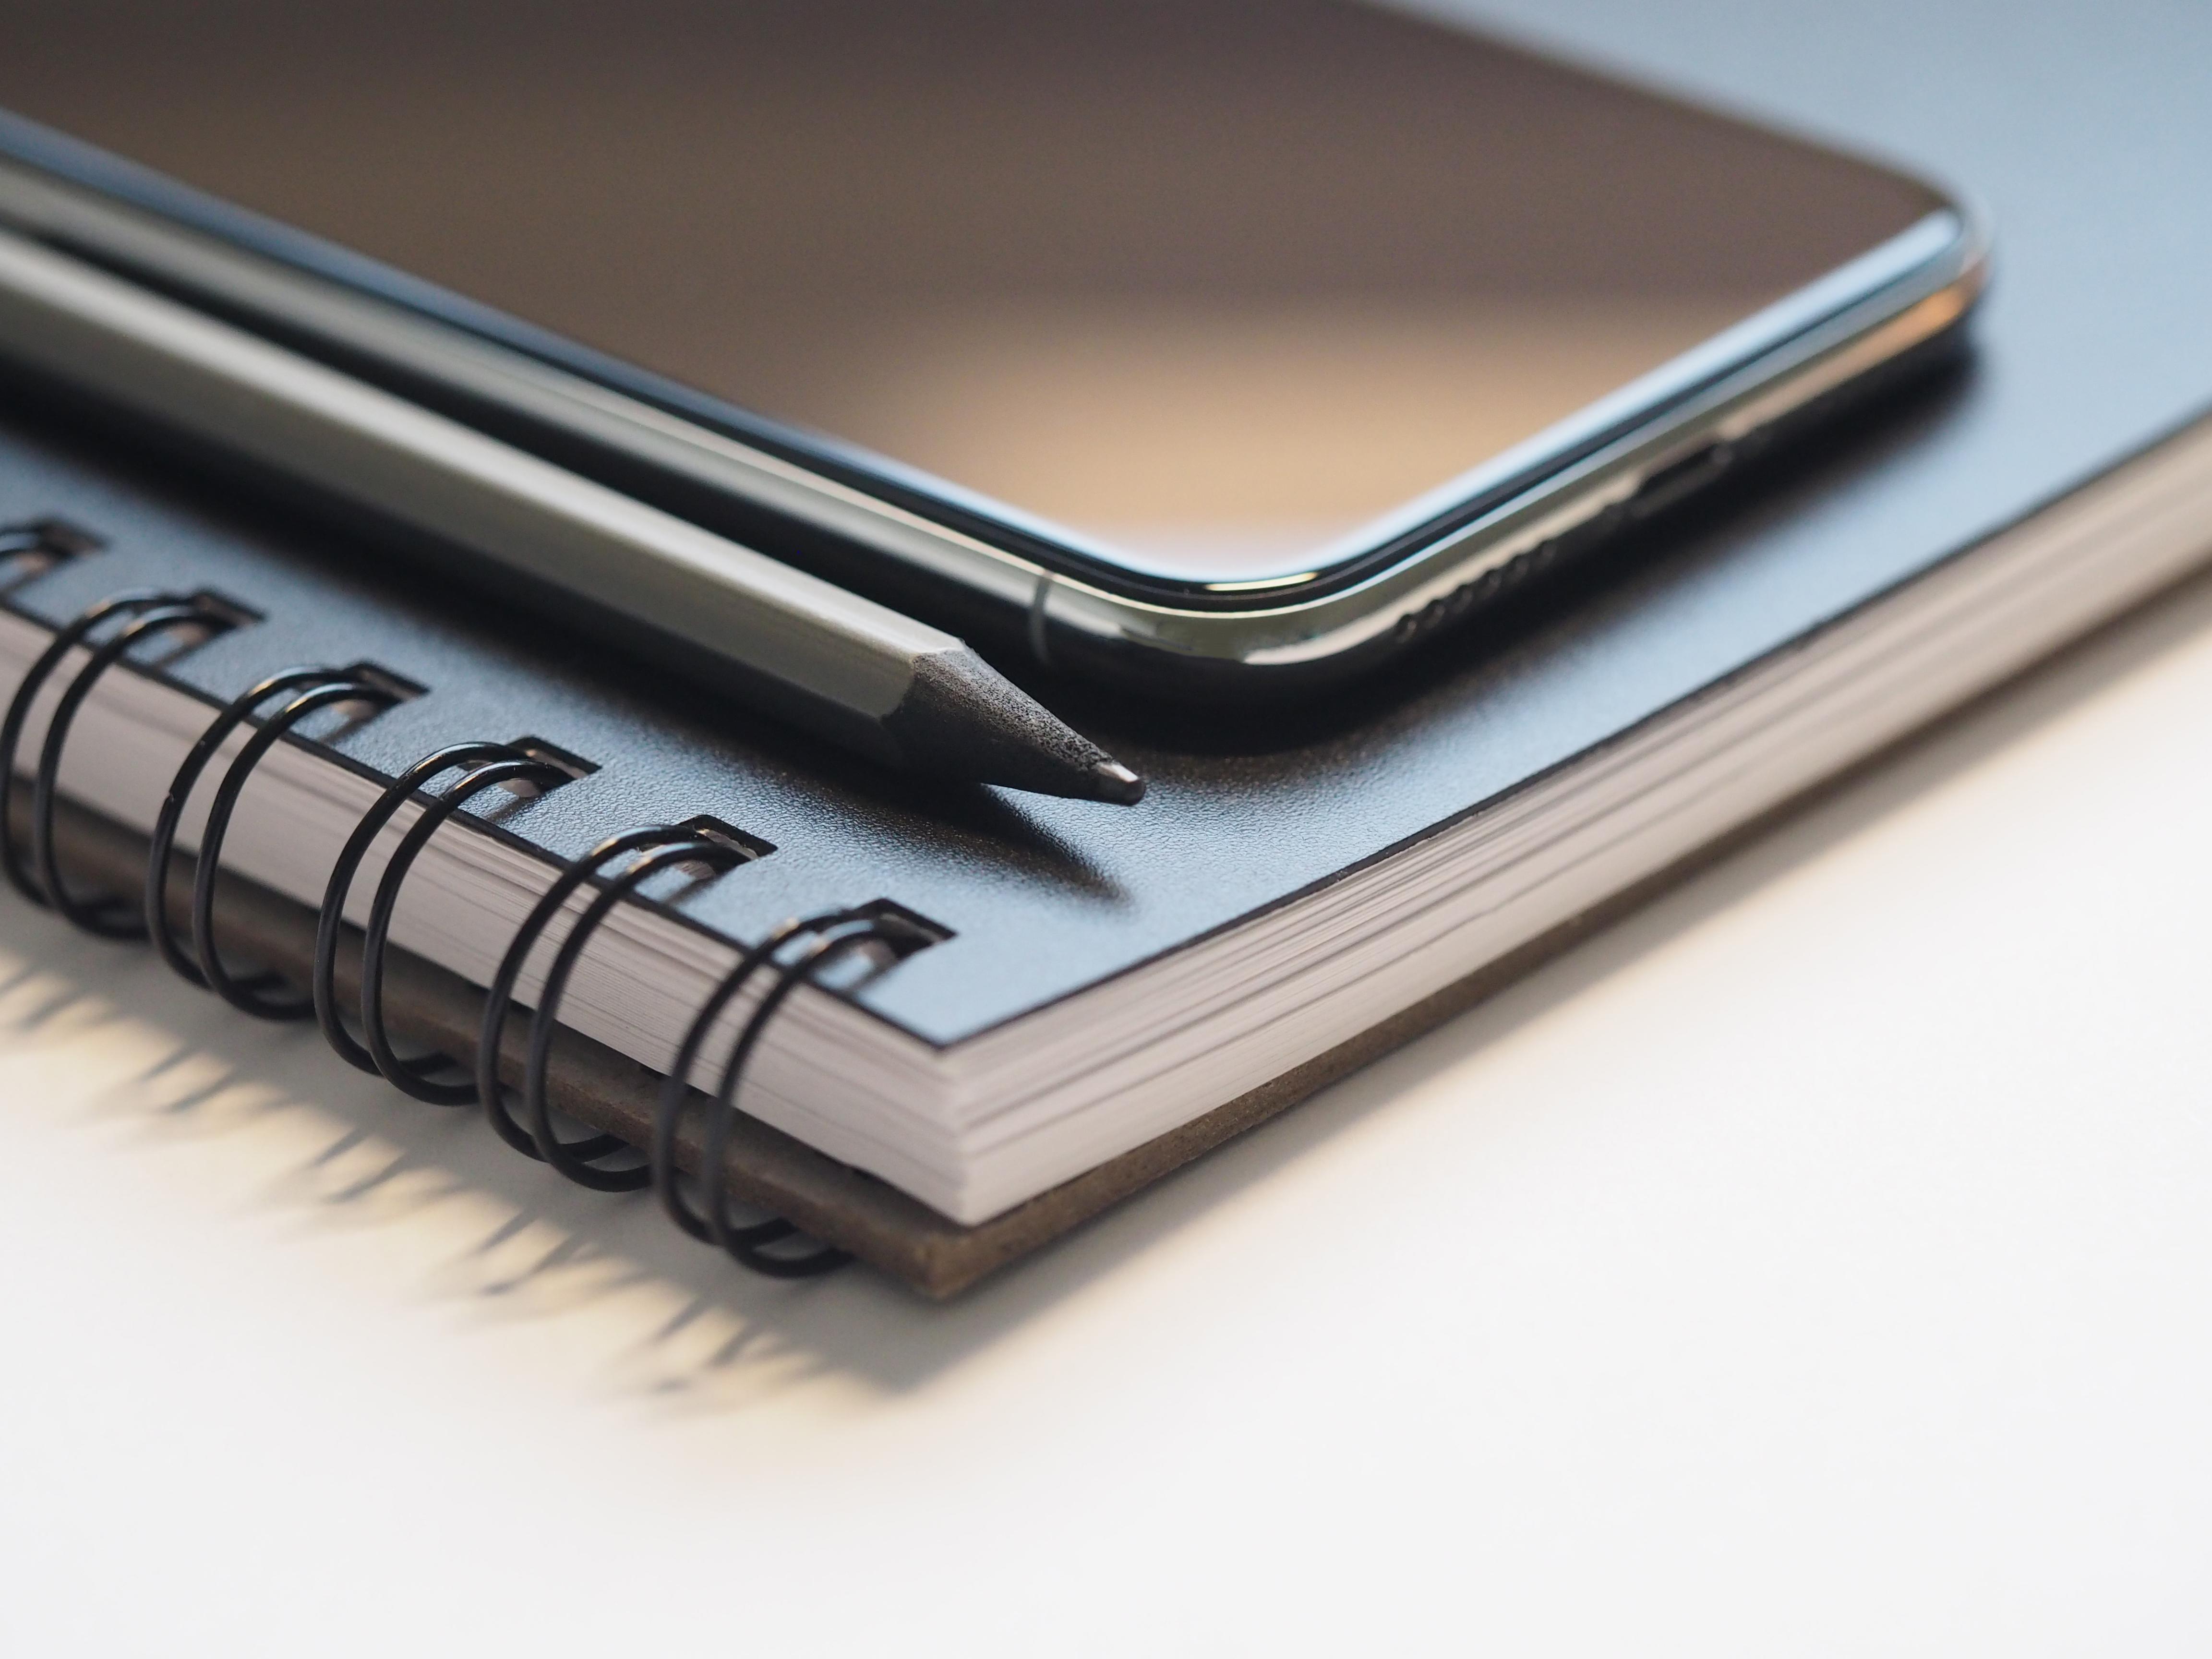 iPhoneXが動かない時の要因・どう対処すれば良い?